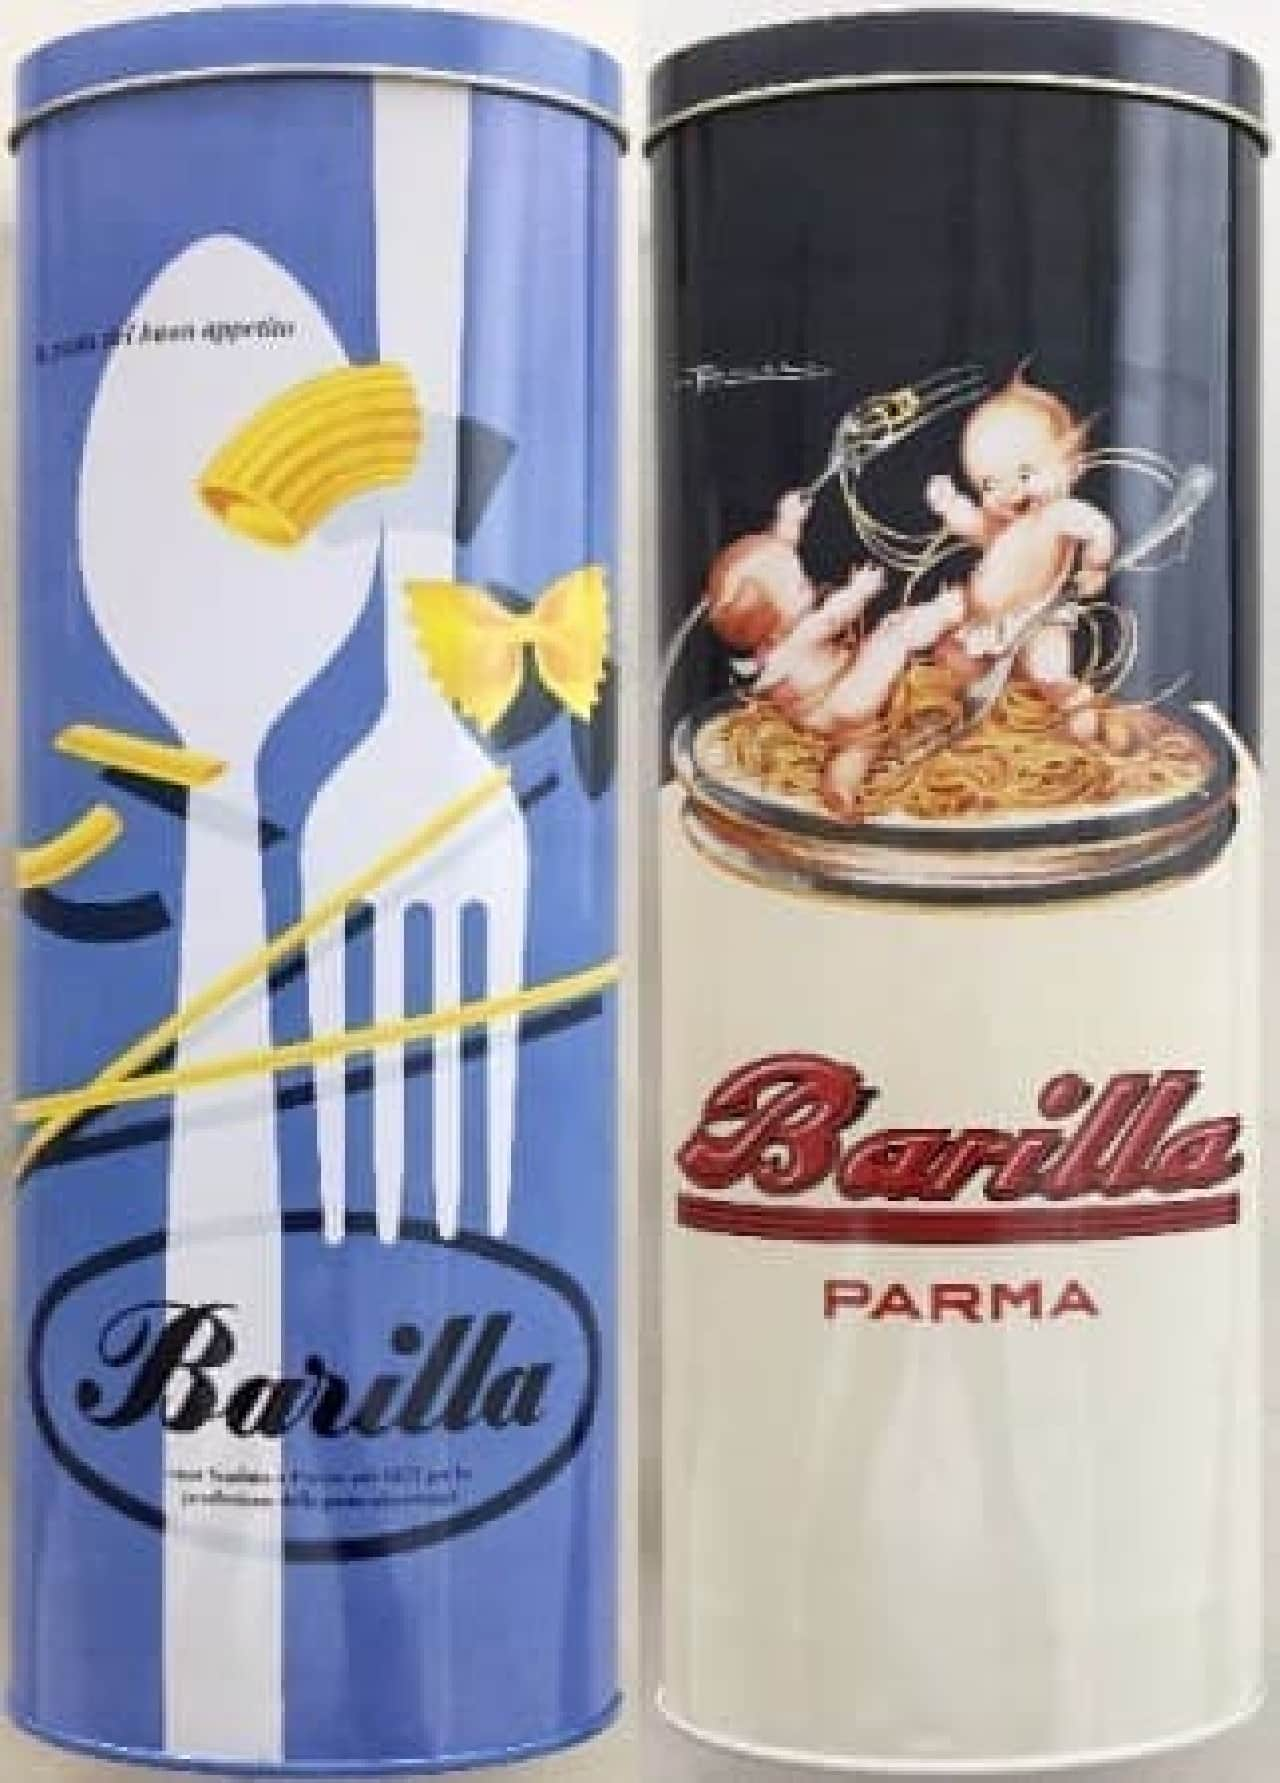 Barilla(バリラ)創立140周年記念パスタセット